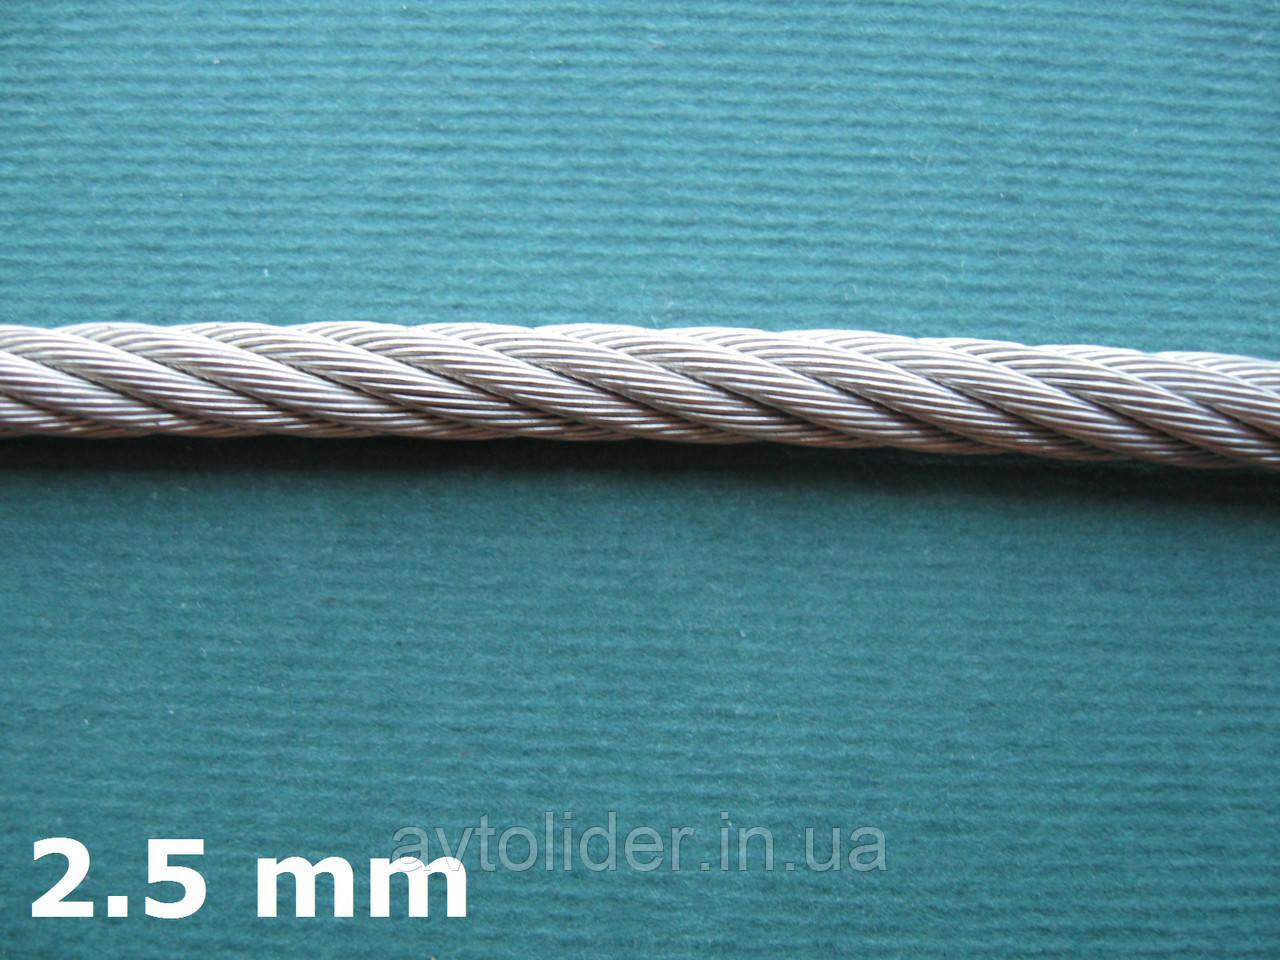 Нержавеющий трос А4, плетение 7х19, диаметр 2,5 мм